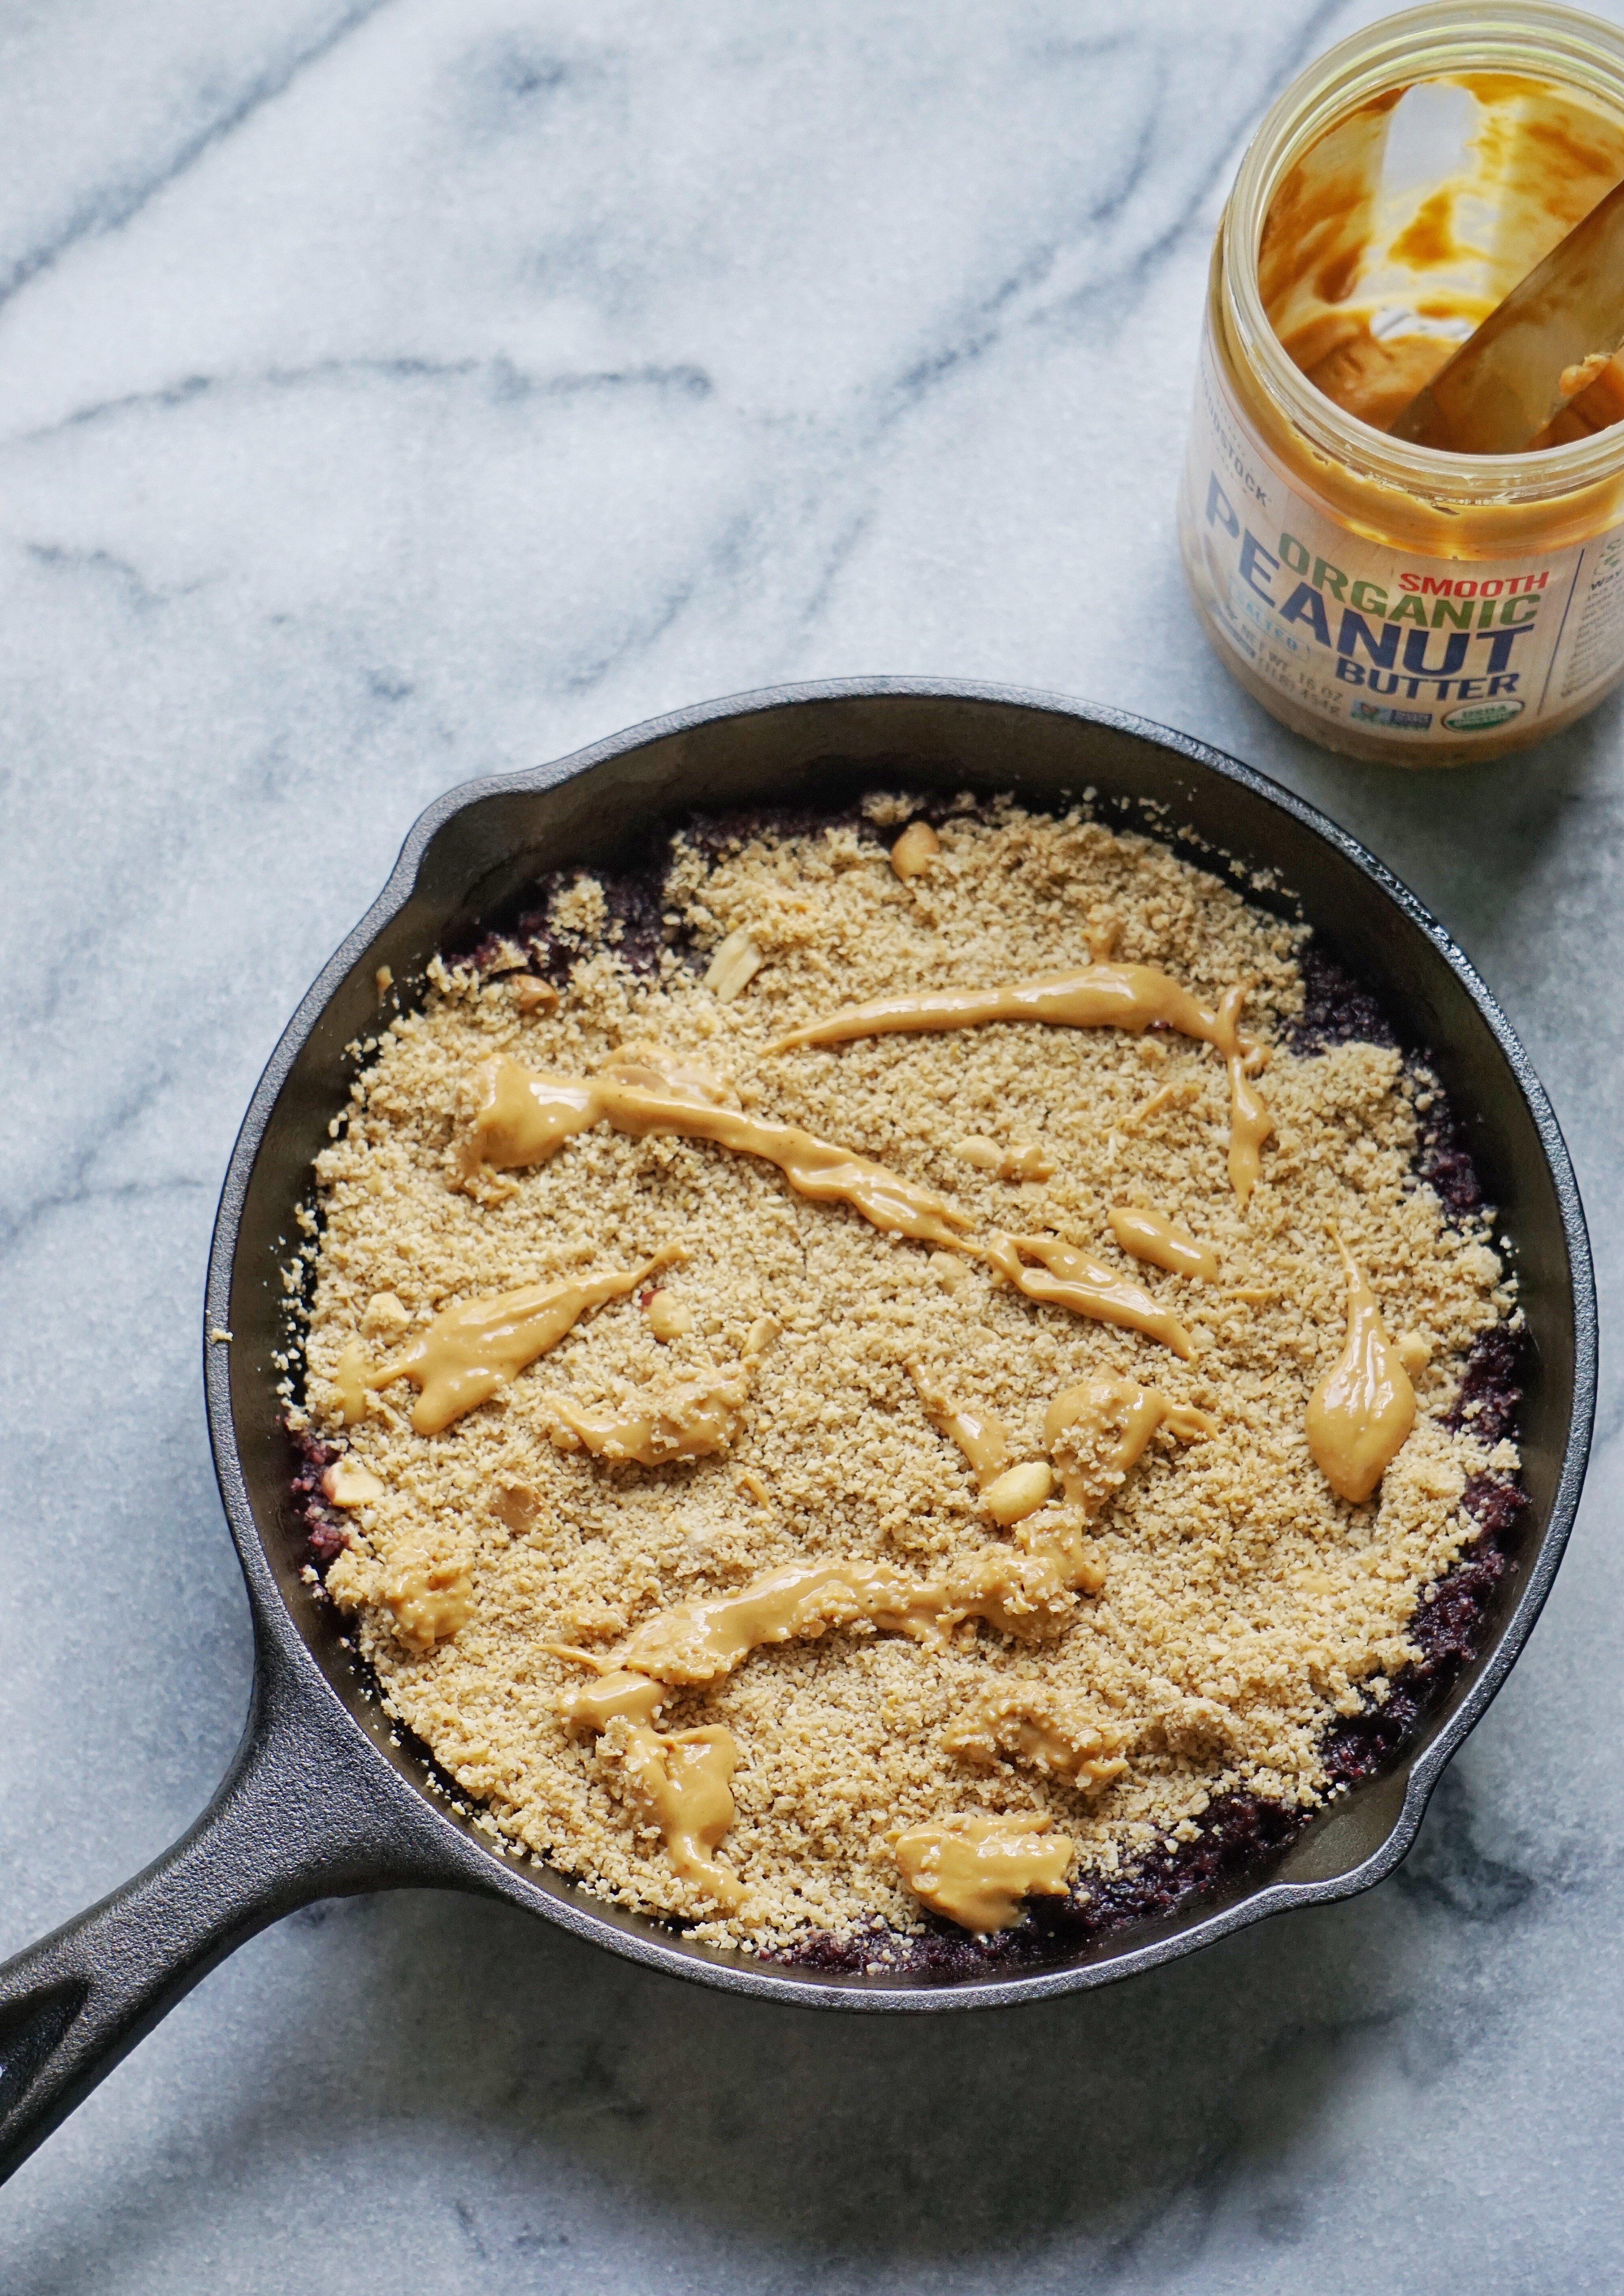 PBJ Crumble Leahs Plate - Peanut Butter & Jelly Crumble